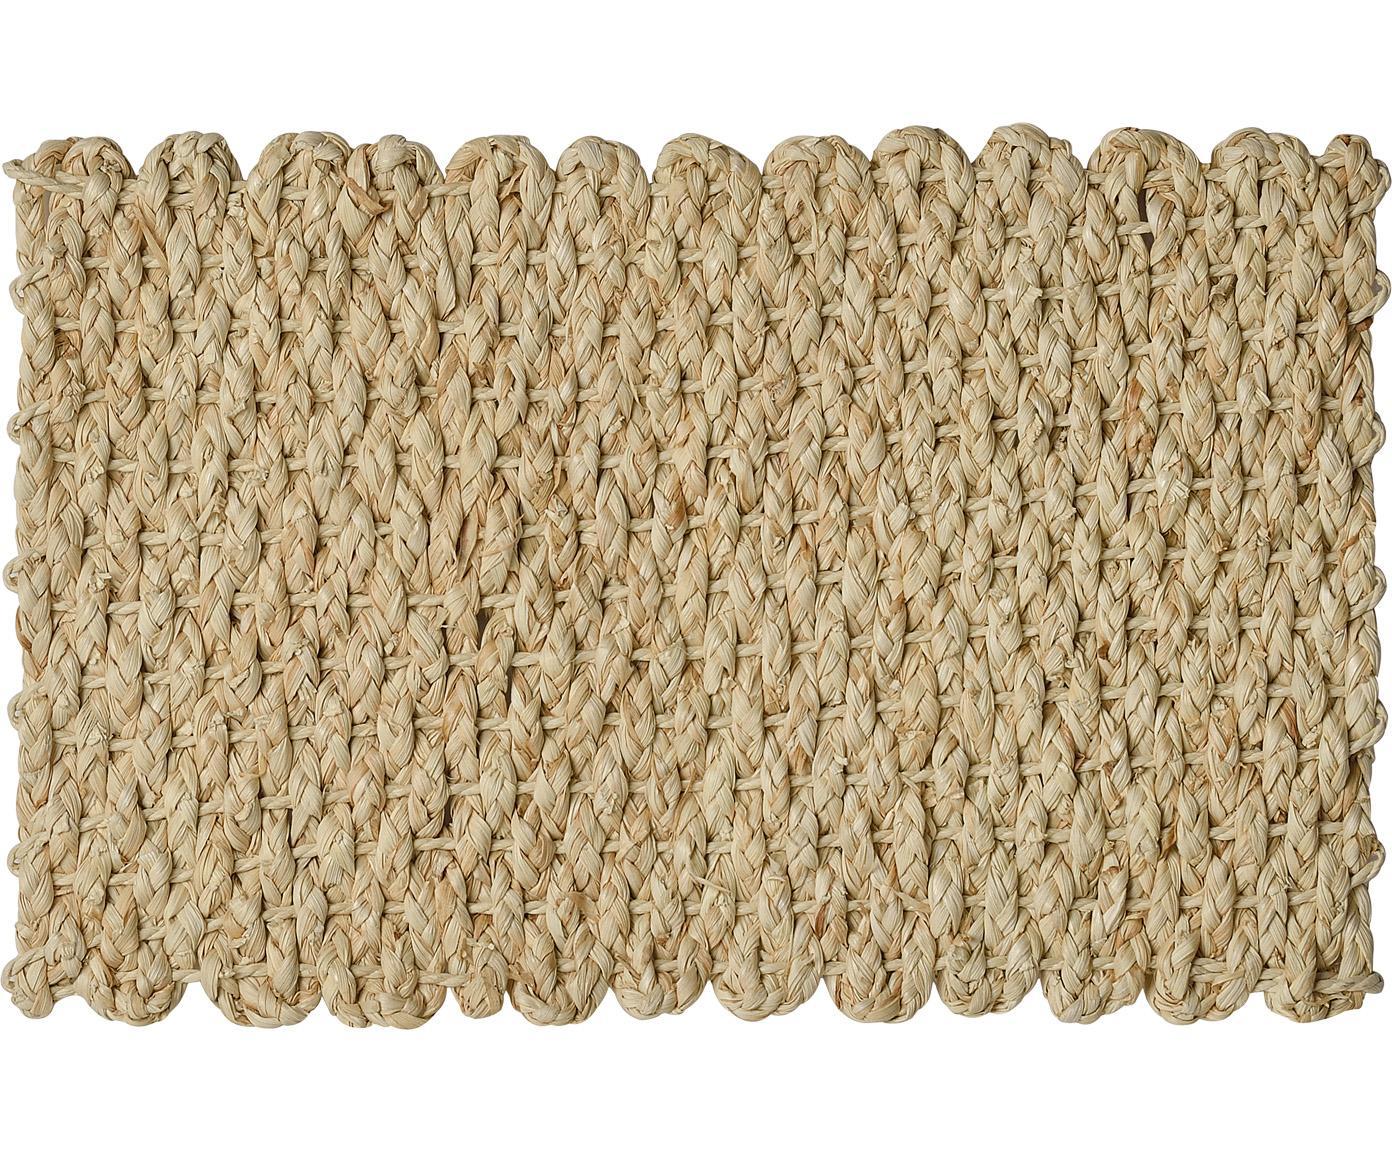 Placemats Cascada van maïsbladeren, 2 stuks, Maïsstengels, Maïskleurig, 30 x 45 cm